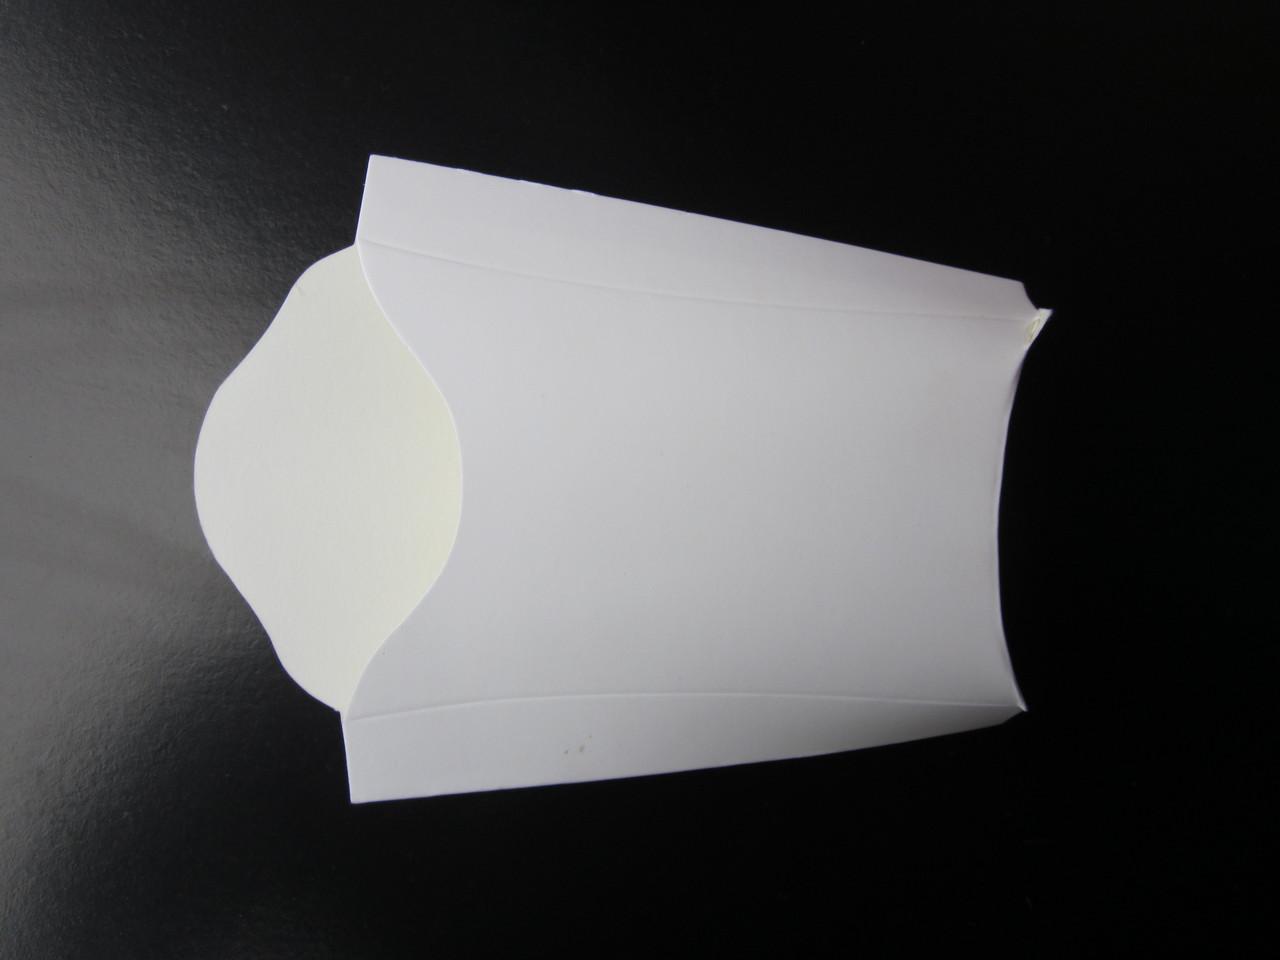 Упаковка картон Фри Midi 175*130